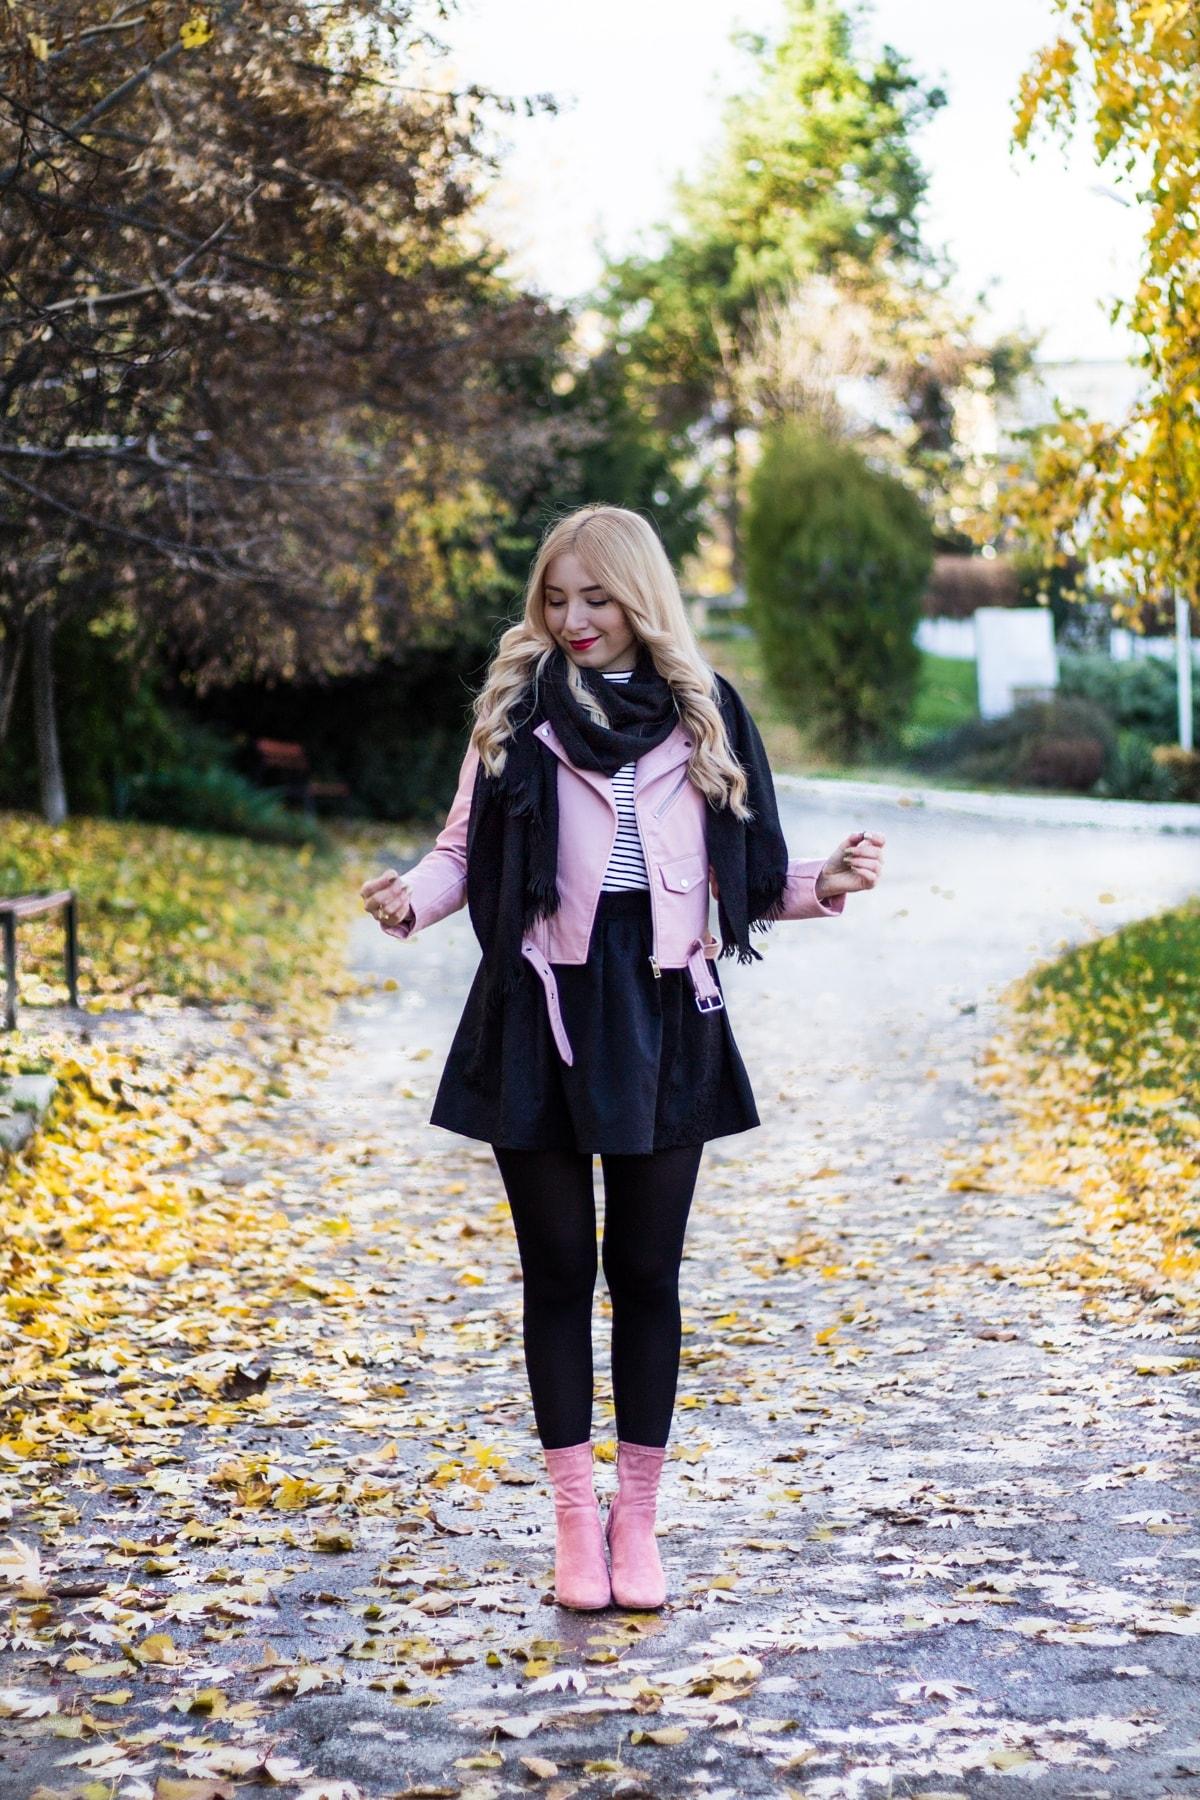 Tinuta de toamna, cum sa asortezi culorile, pantofi, botine roz, geaza Zara roz,cum purtam roz cu negru, Andreea Ristea